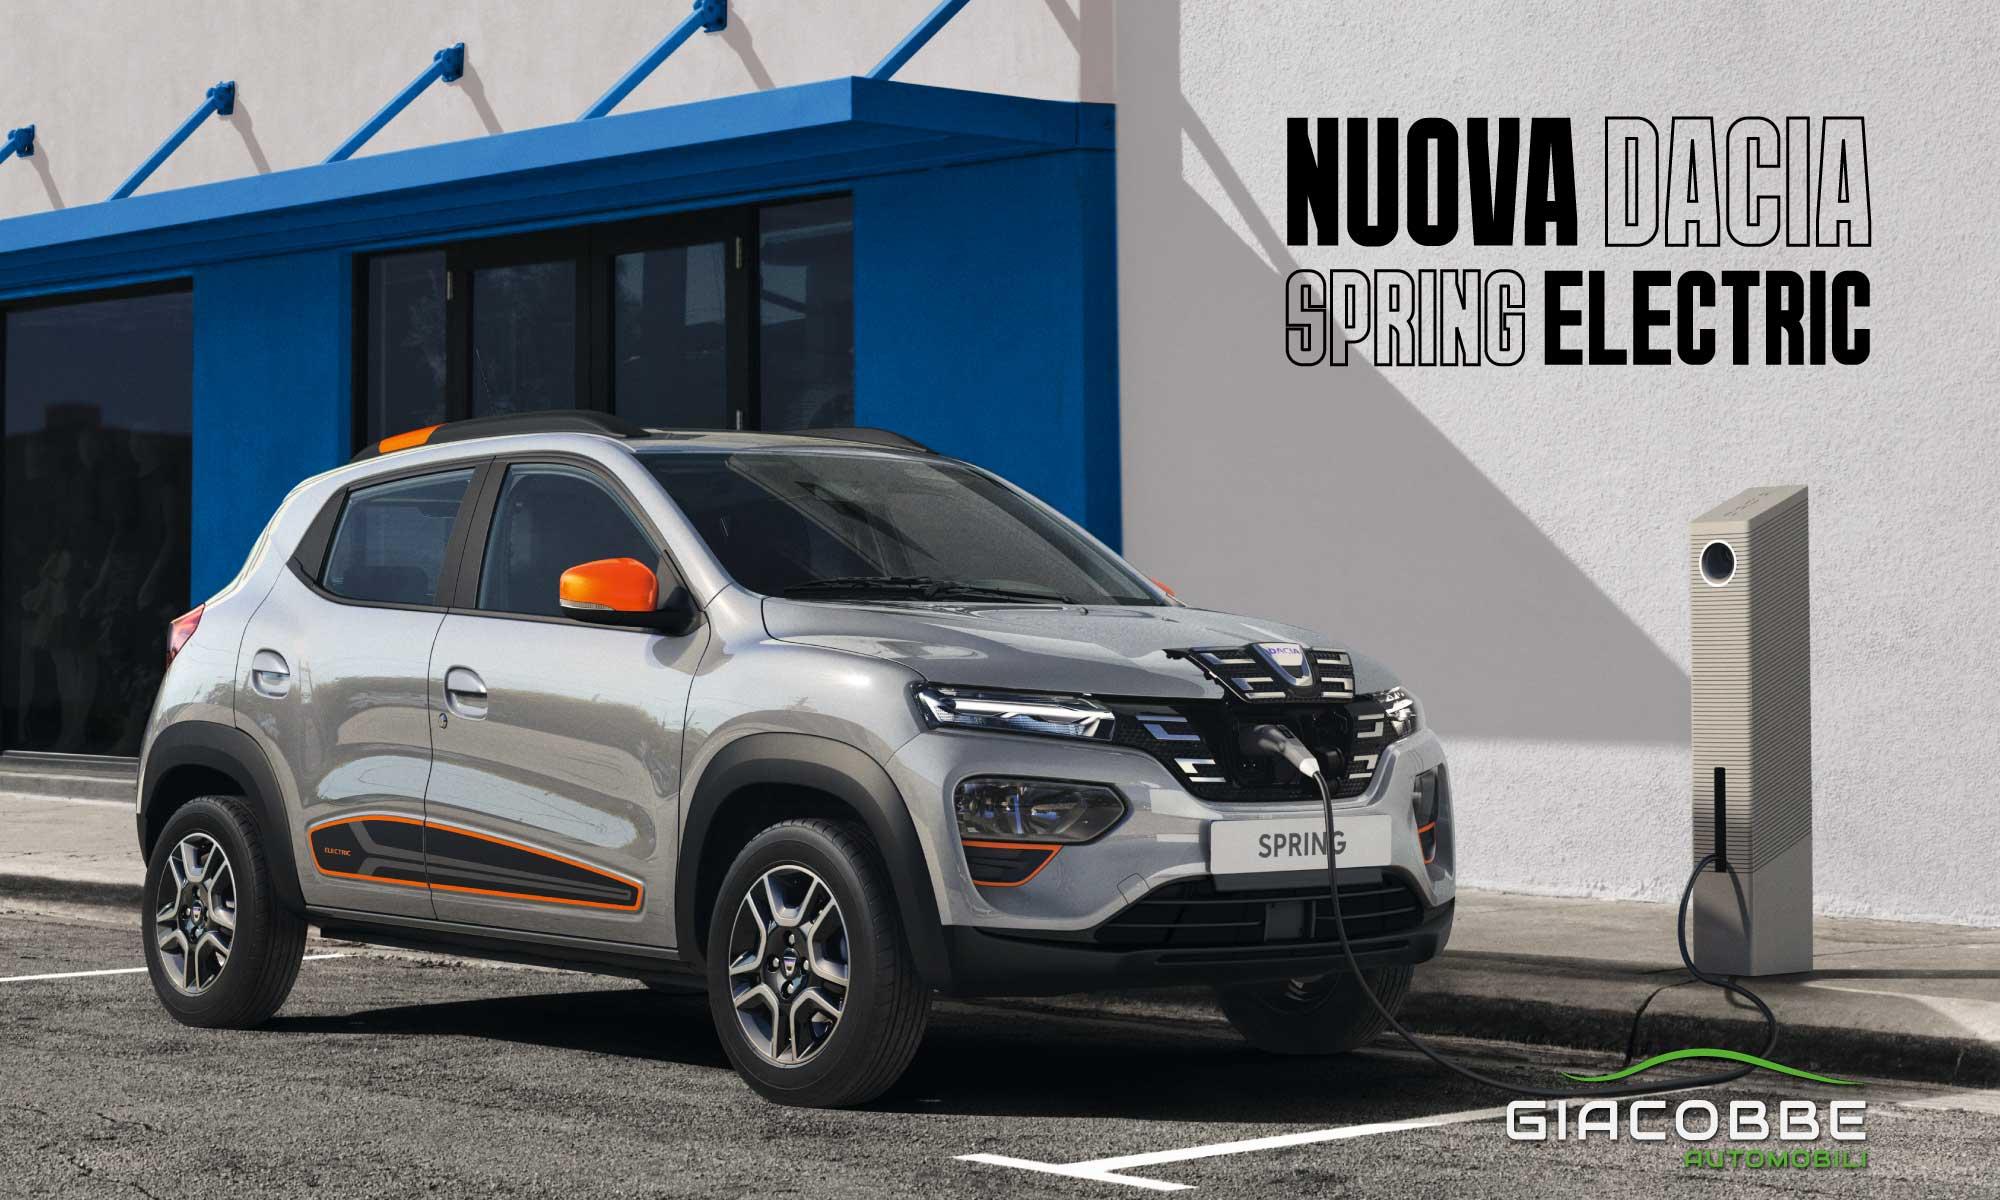 Nuova Dacia Spring Electric